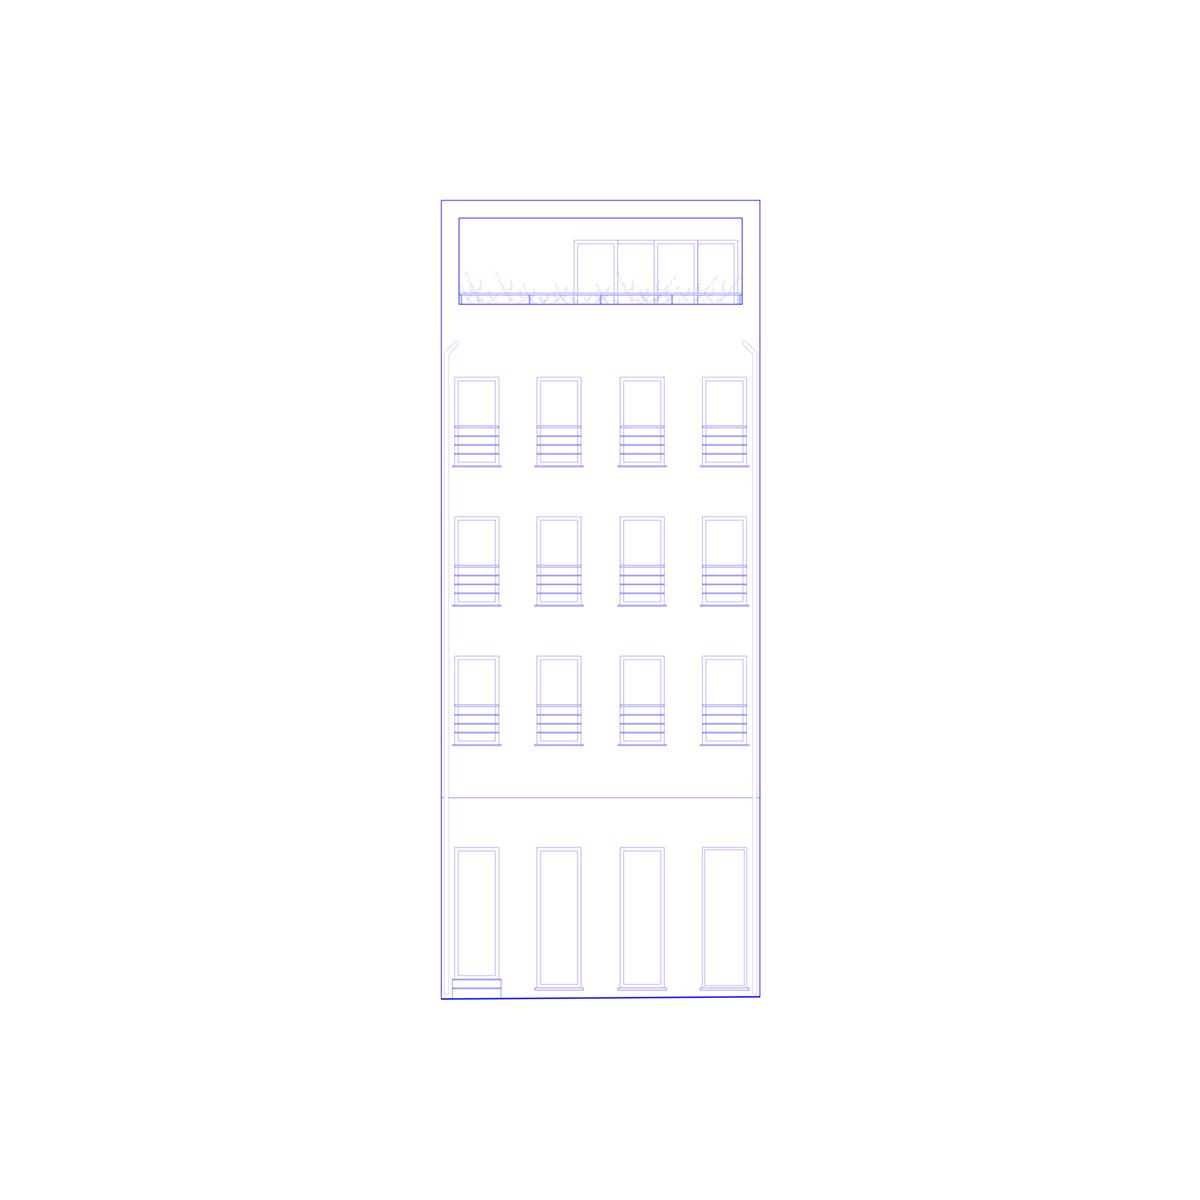 6 Apartments_01.jpg